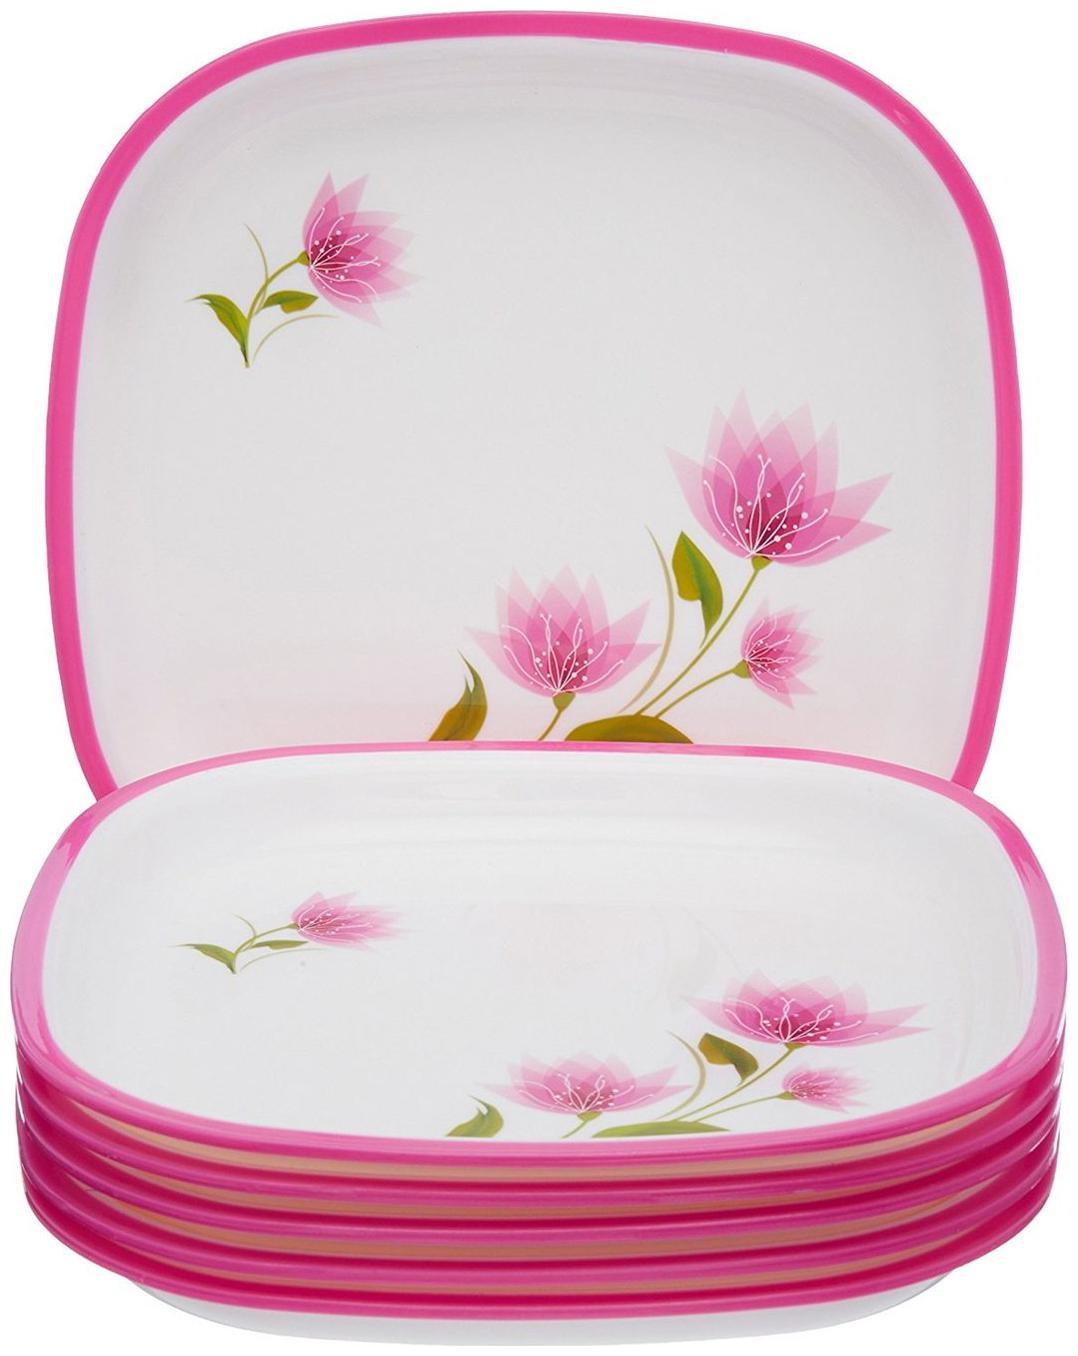 Nayasa Square Quarter Plate Set;Set of 6;Pink